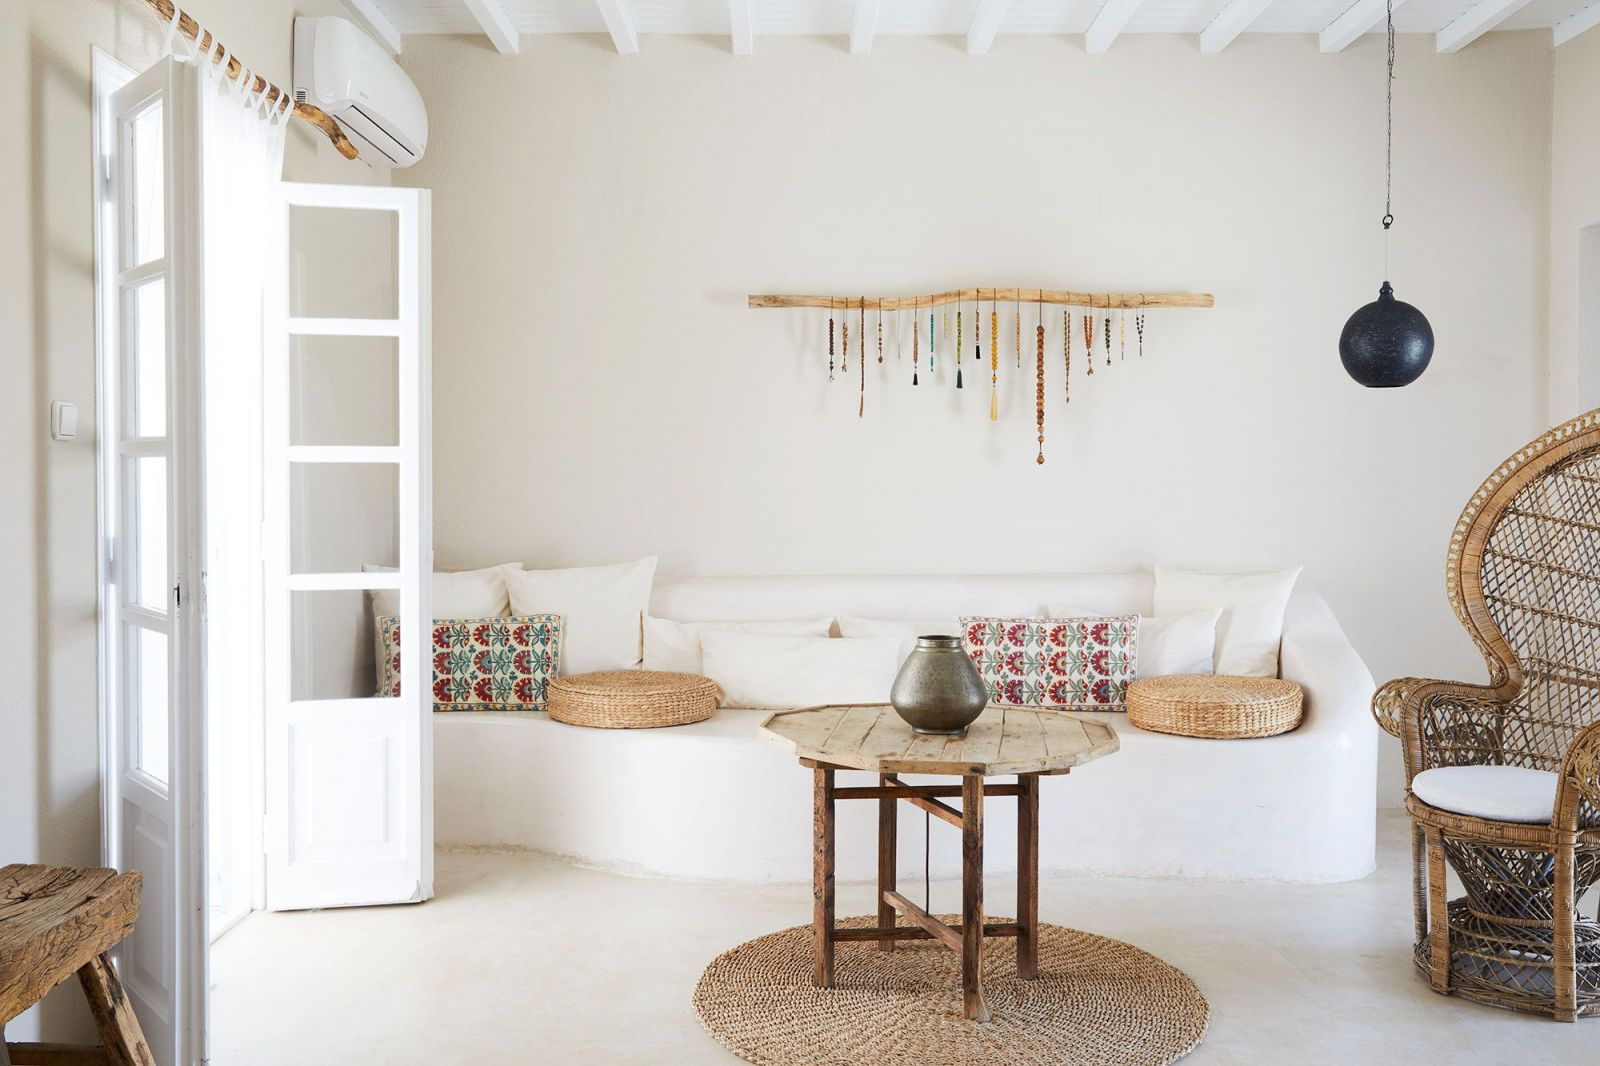 Beautiful homemade wall decoration ideas